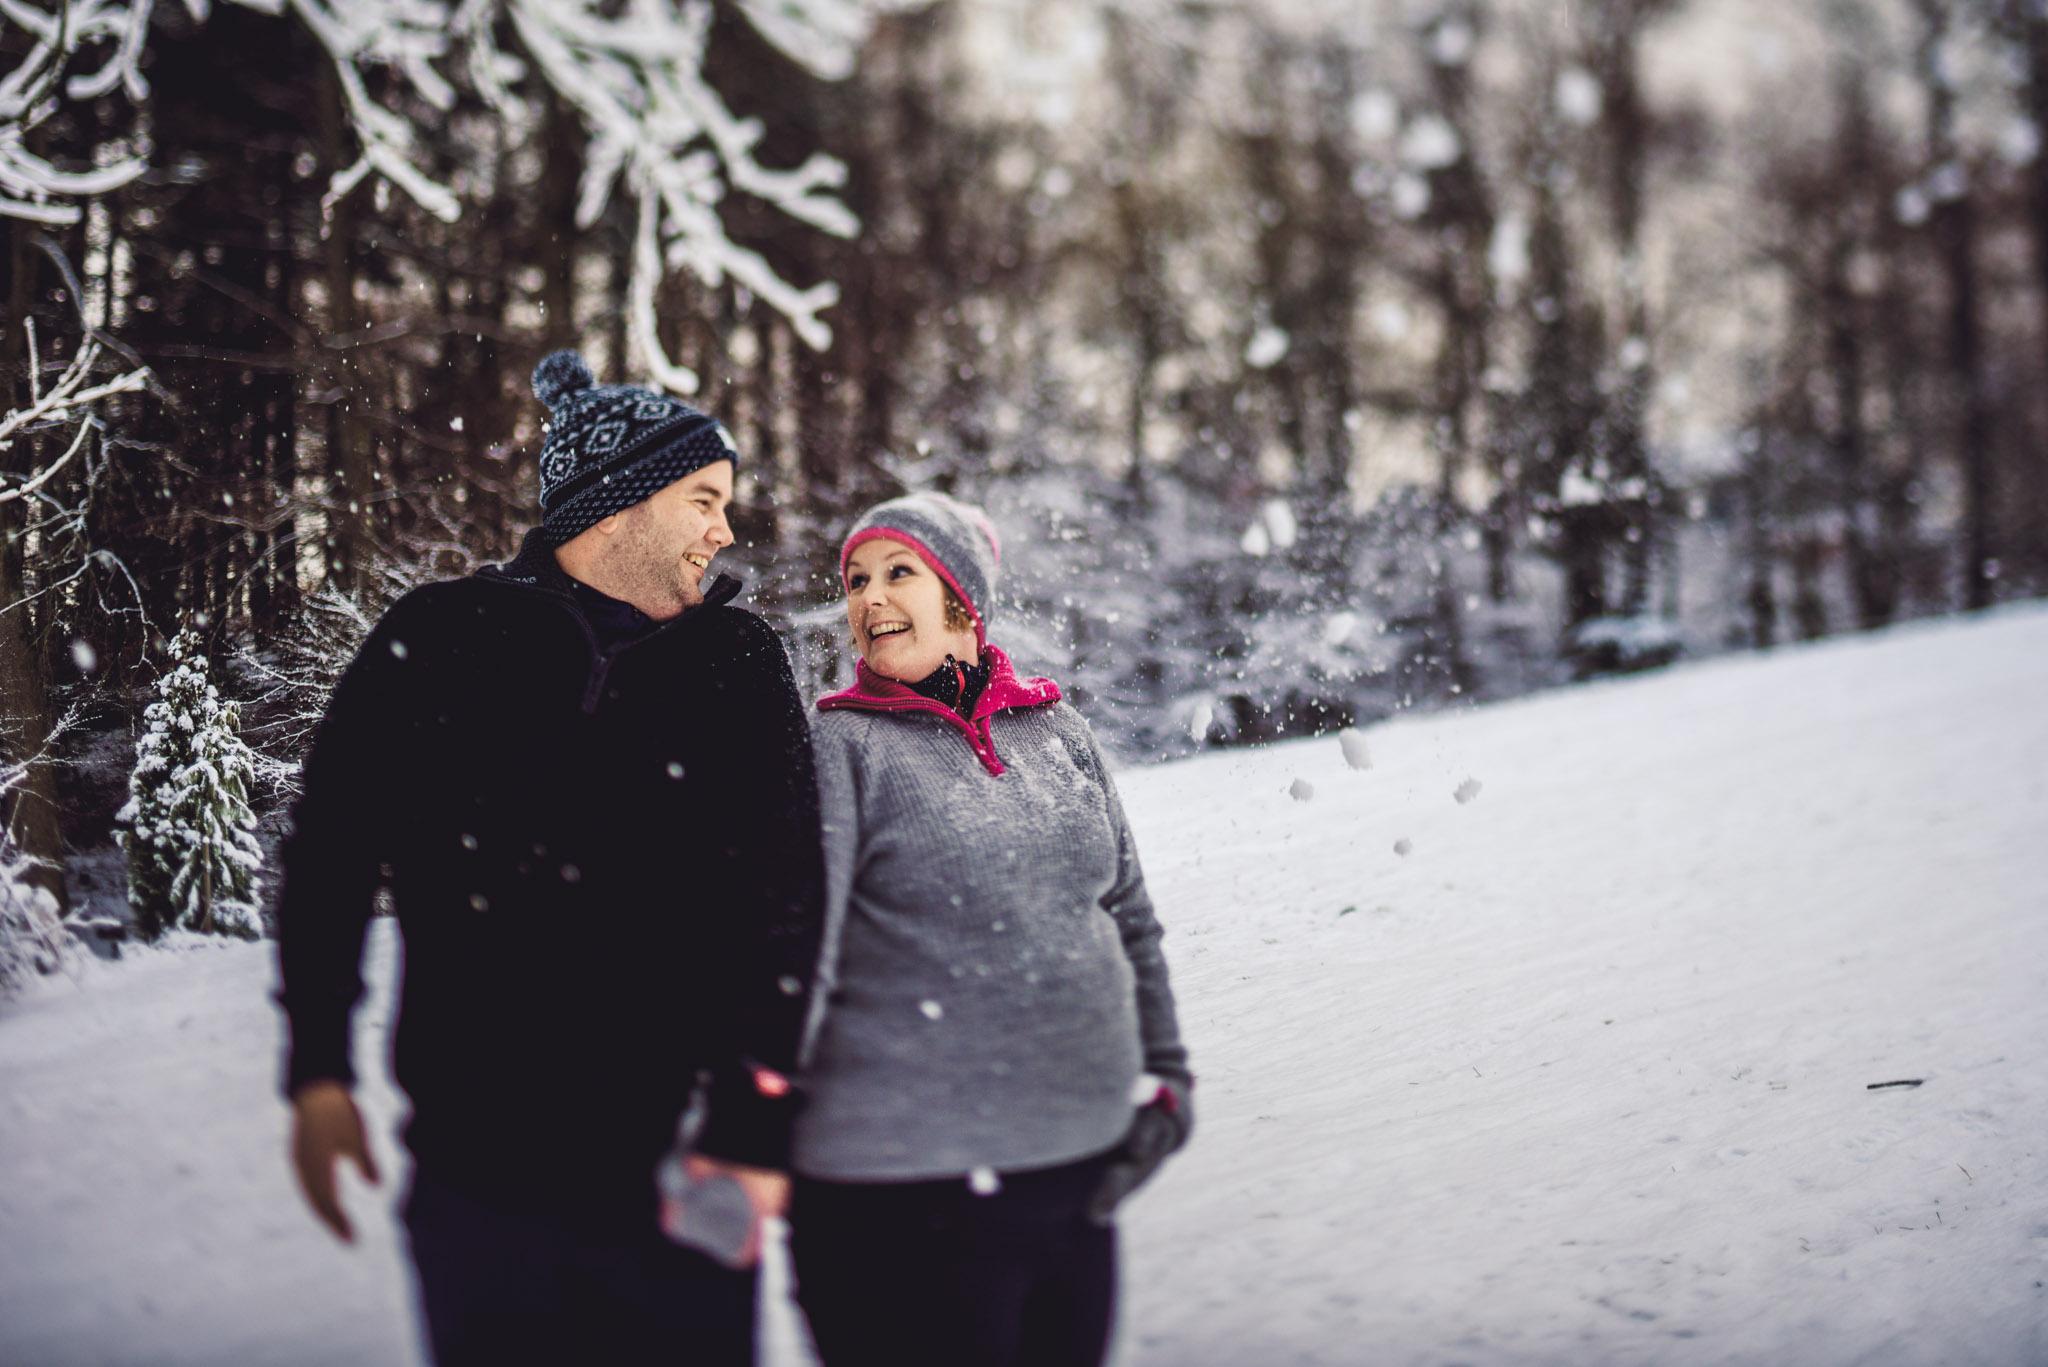 Bryllupsfotograf- stavanger-forlovet-vinterbilder-eirik-halvorsen-6.jpg